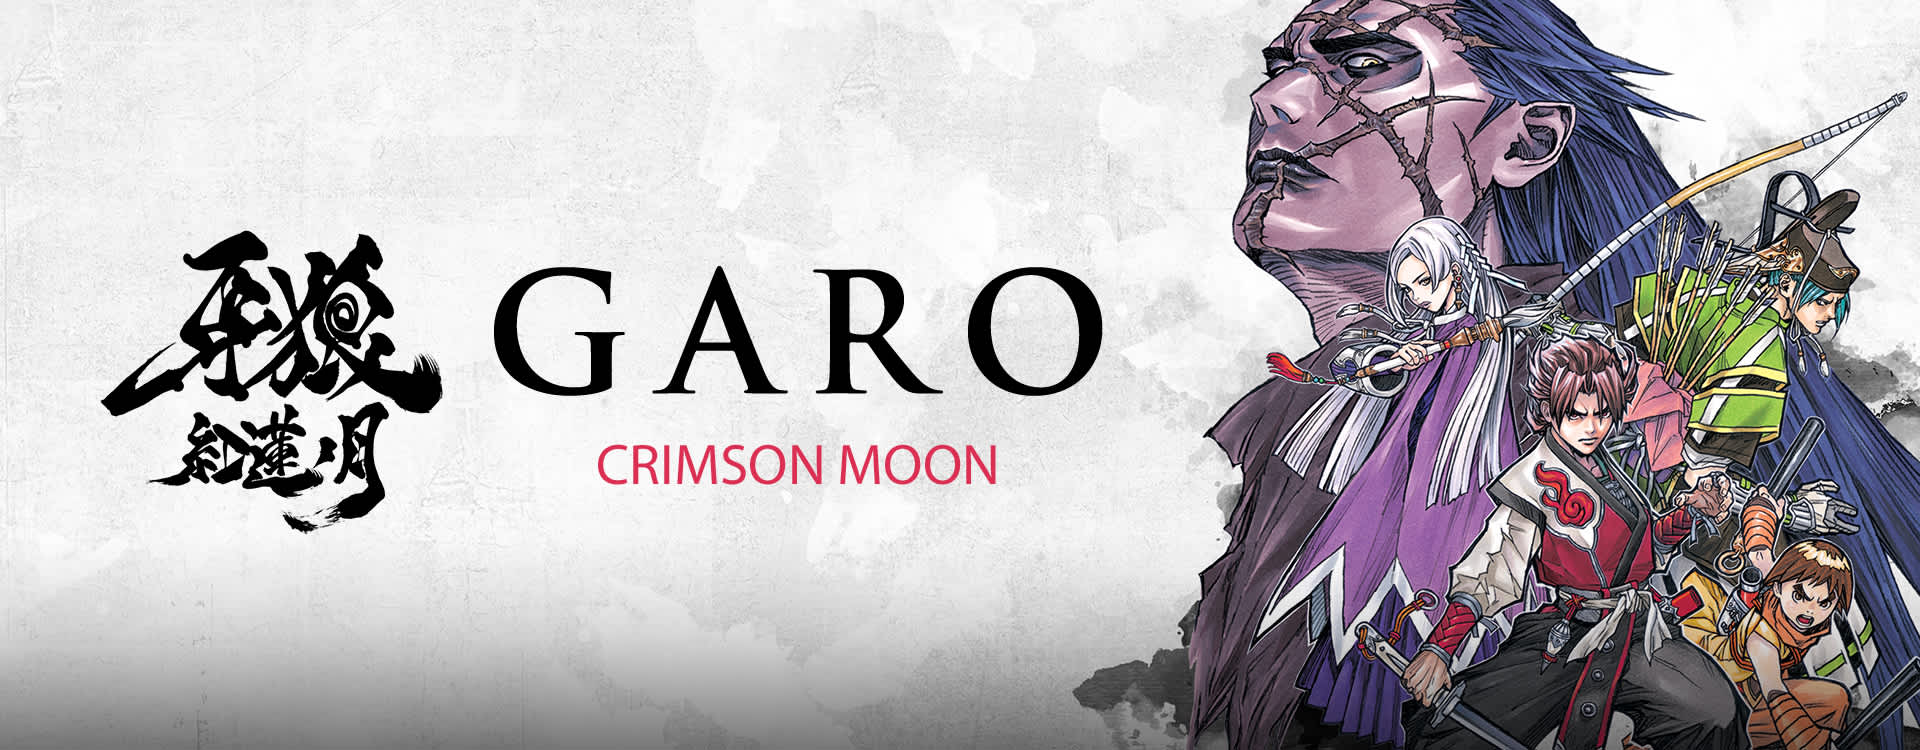 GARO: CRIMSON MOON